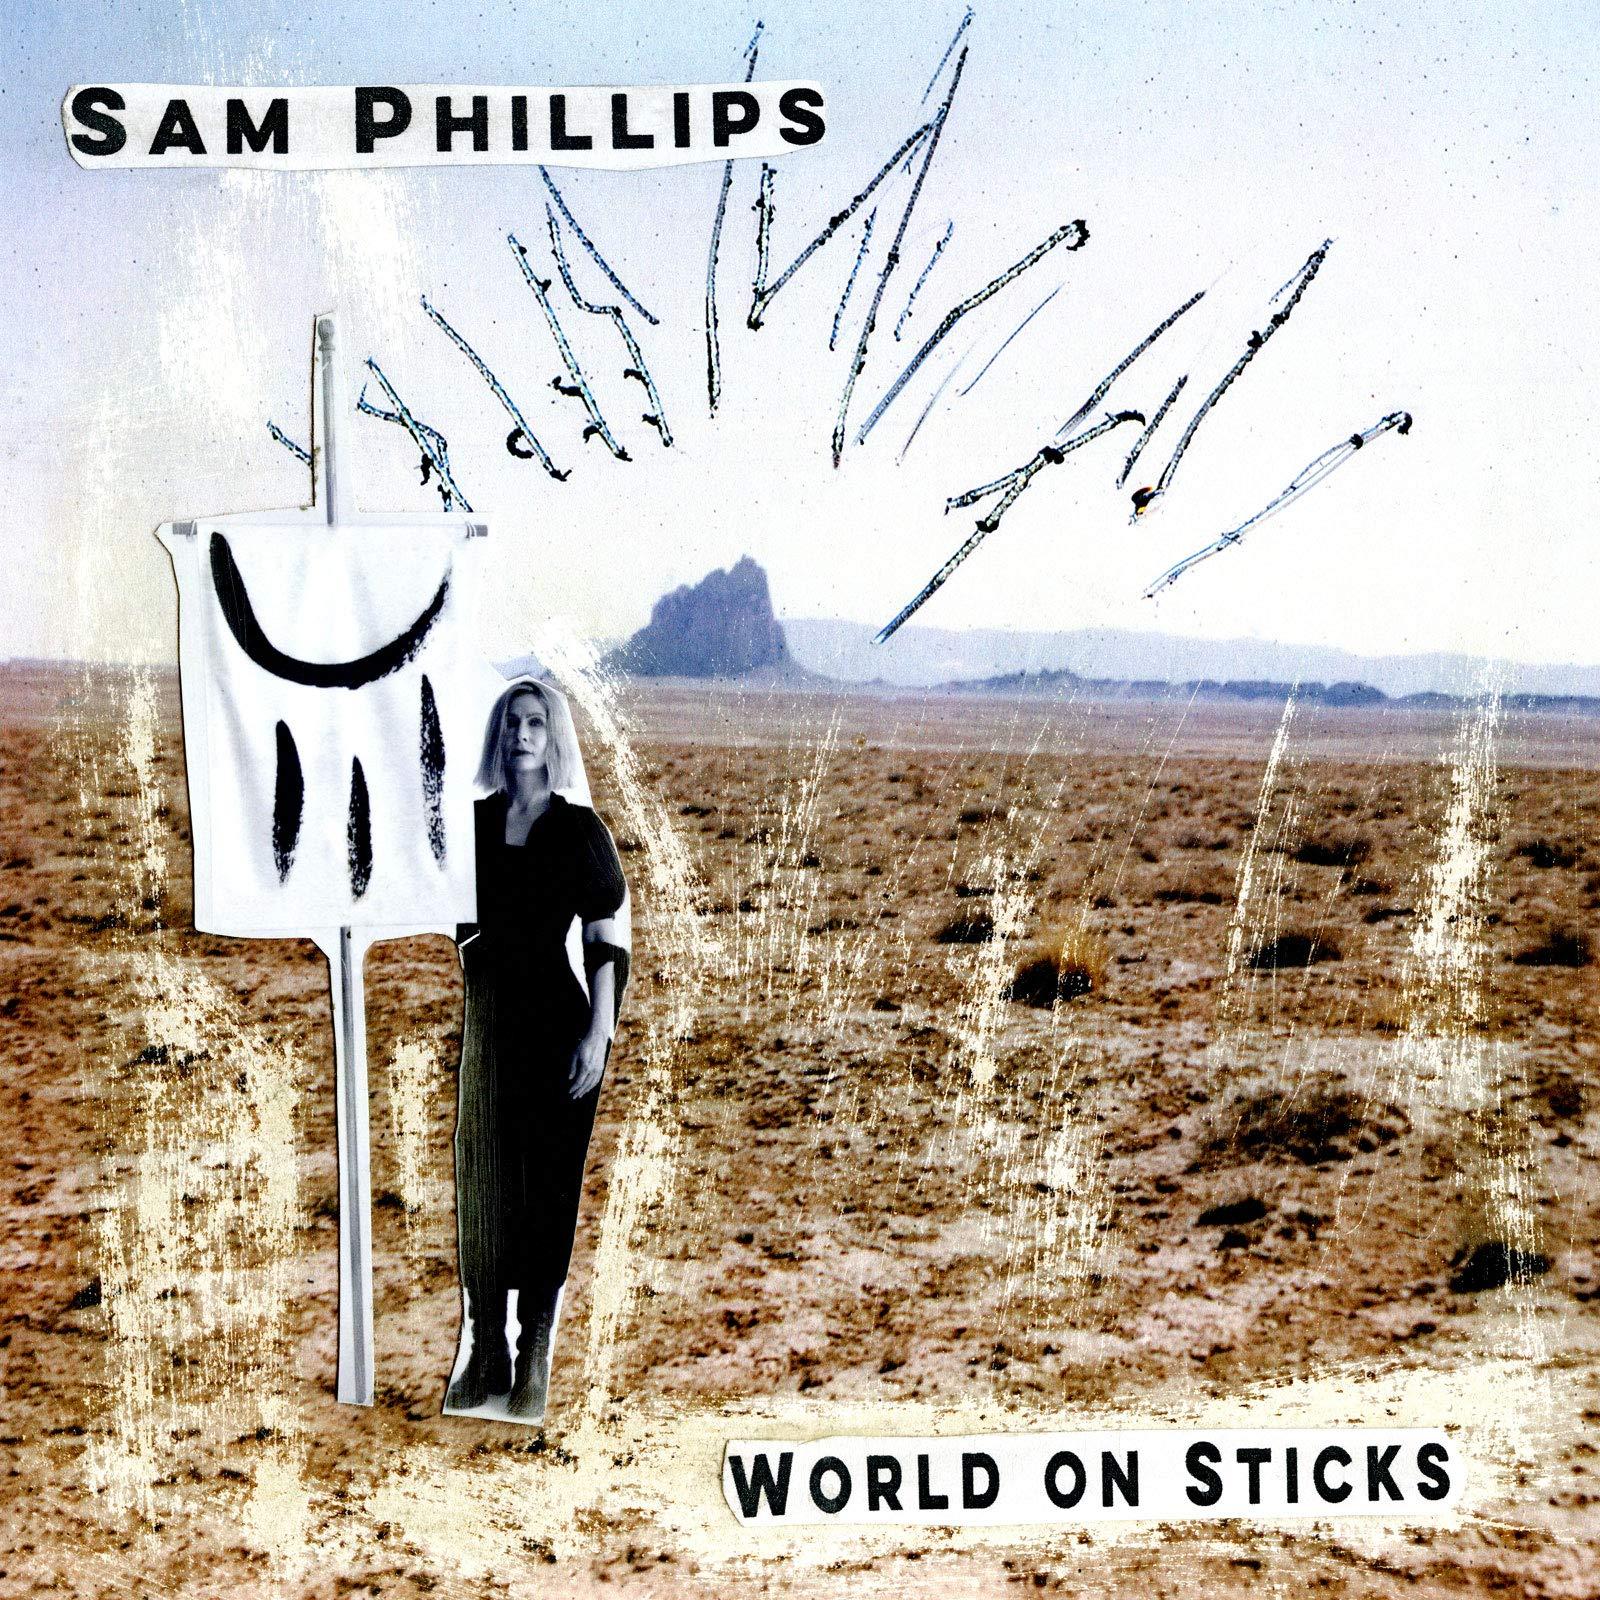 World on Sticks